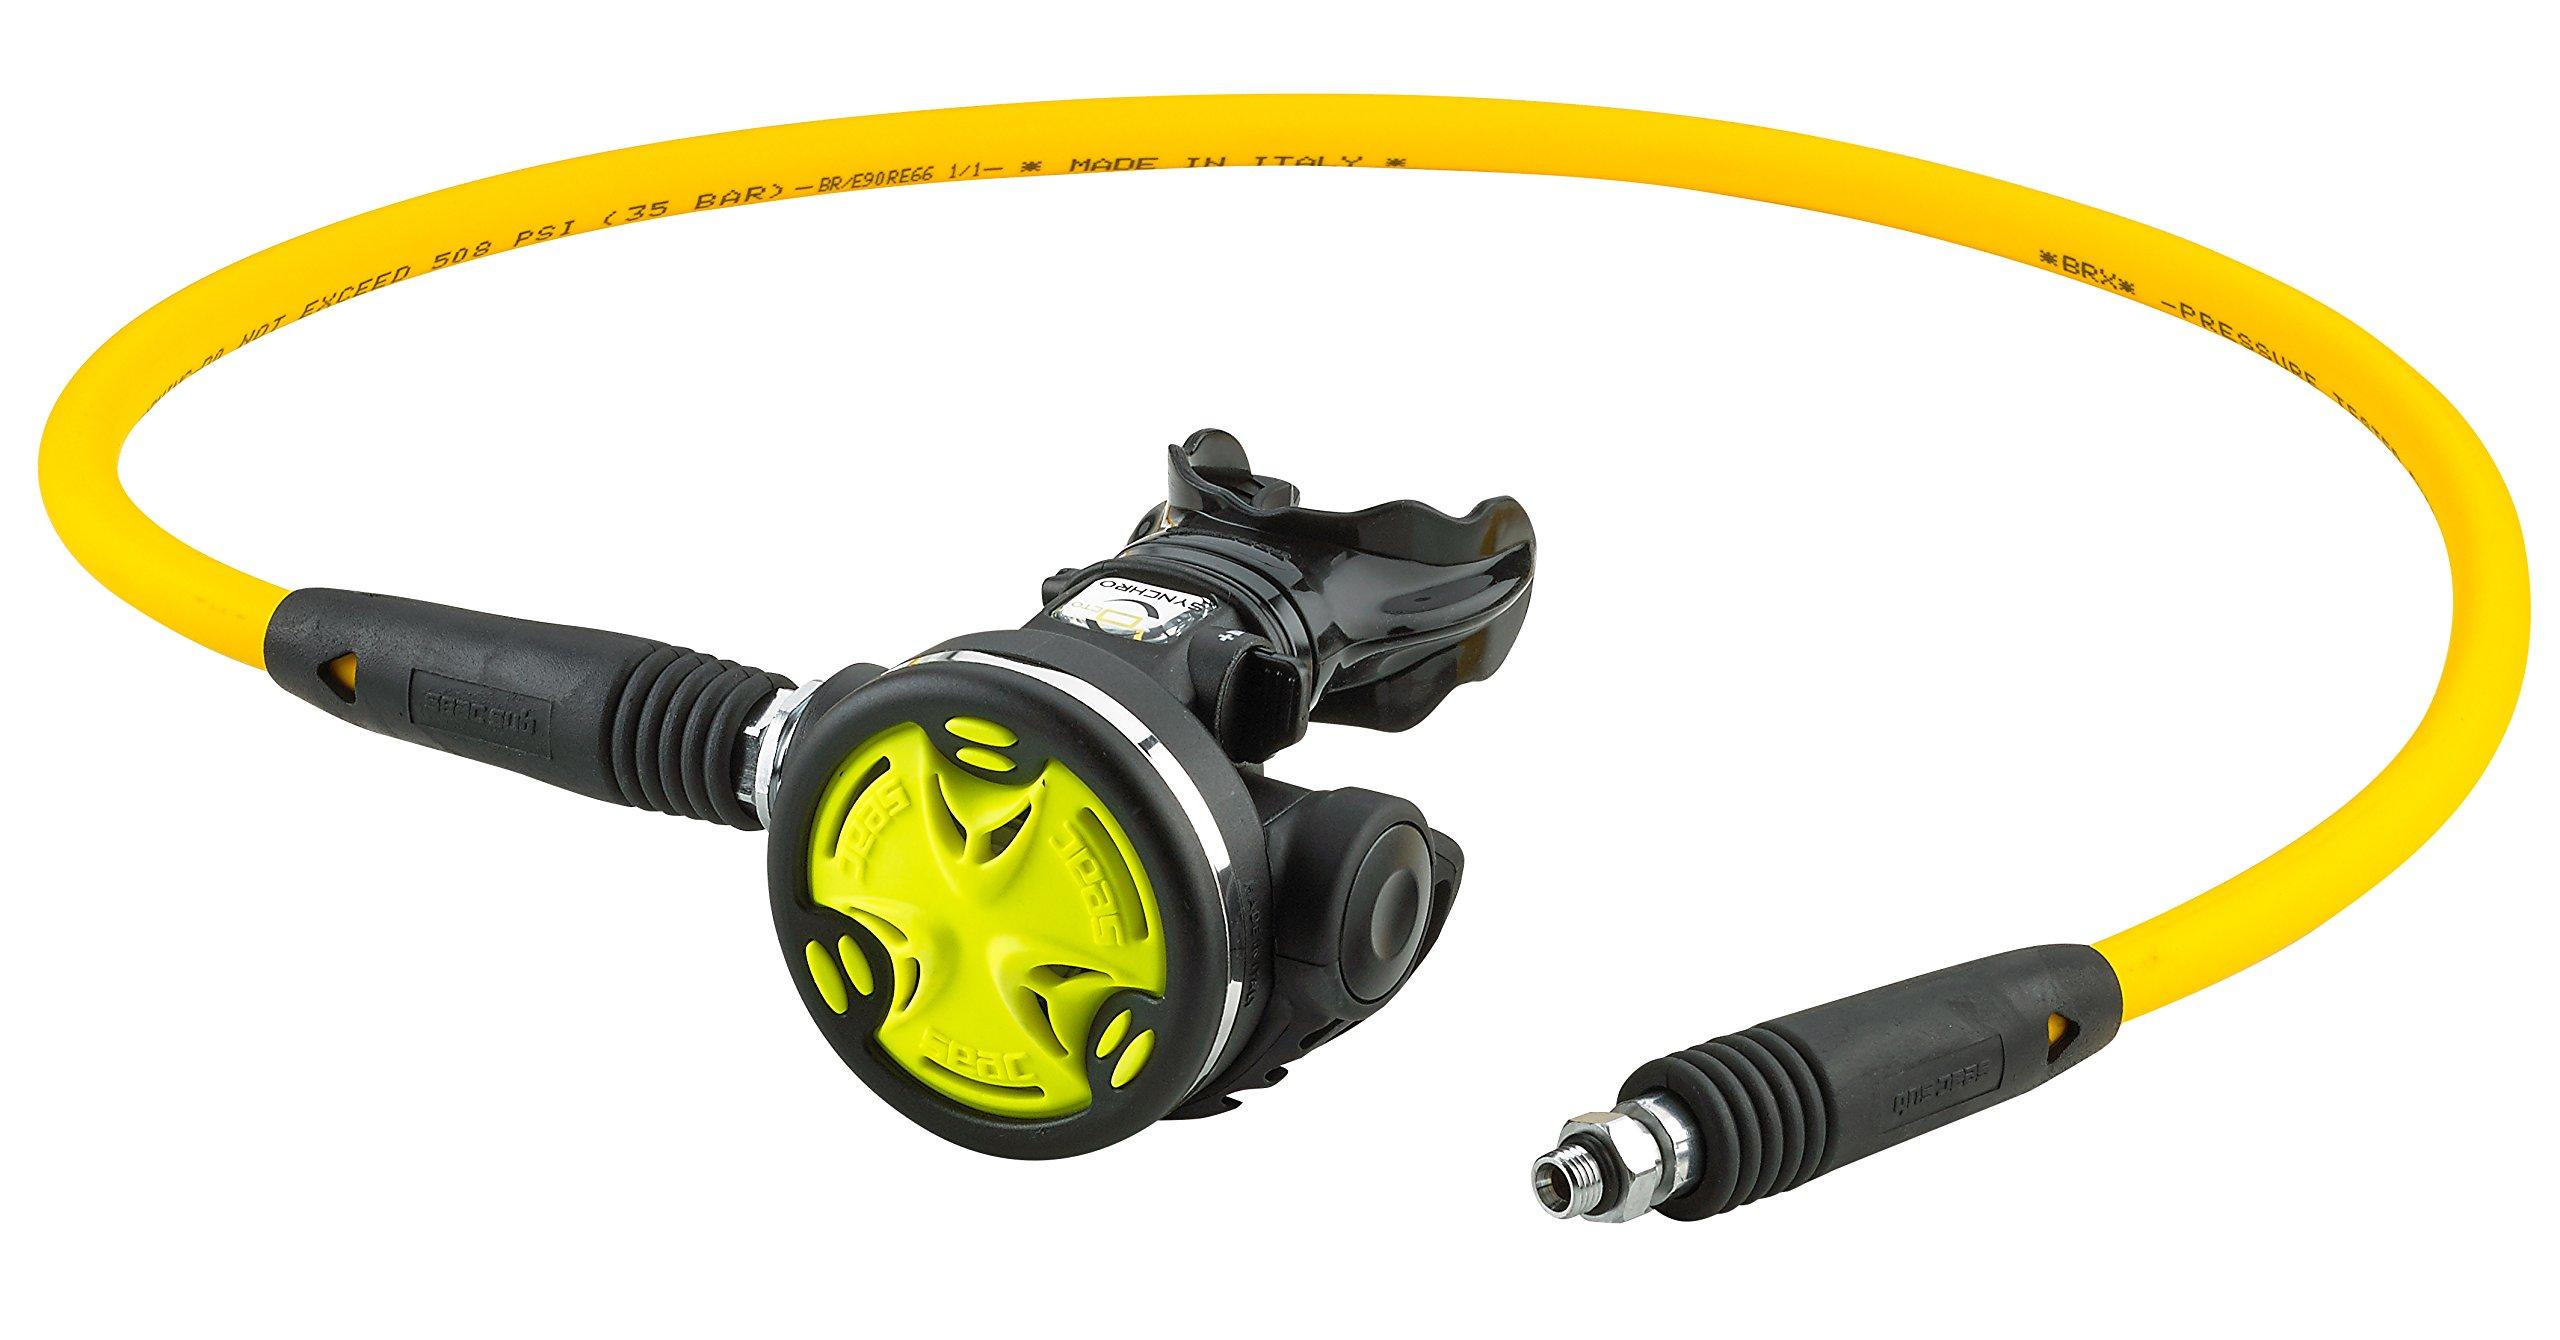 SEAC Scuba Diving Octo Synchro Regulator (Yellow with Hose)